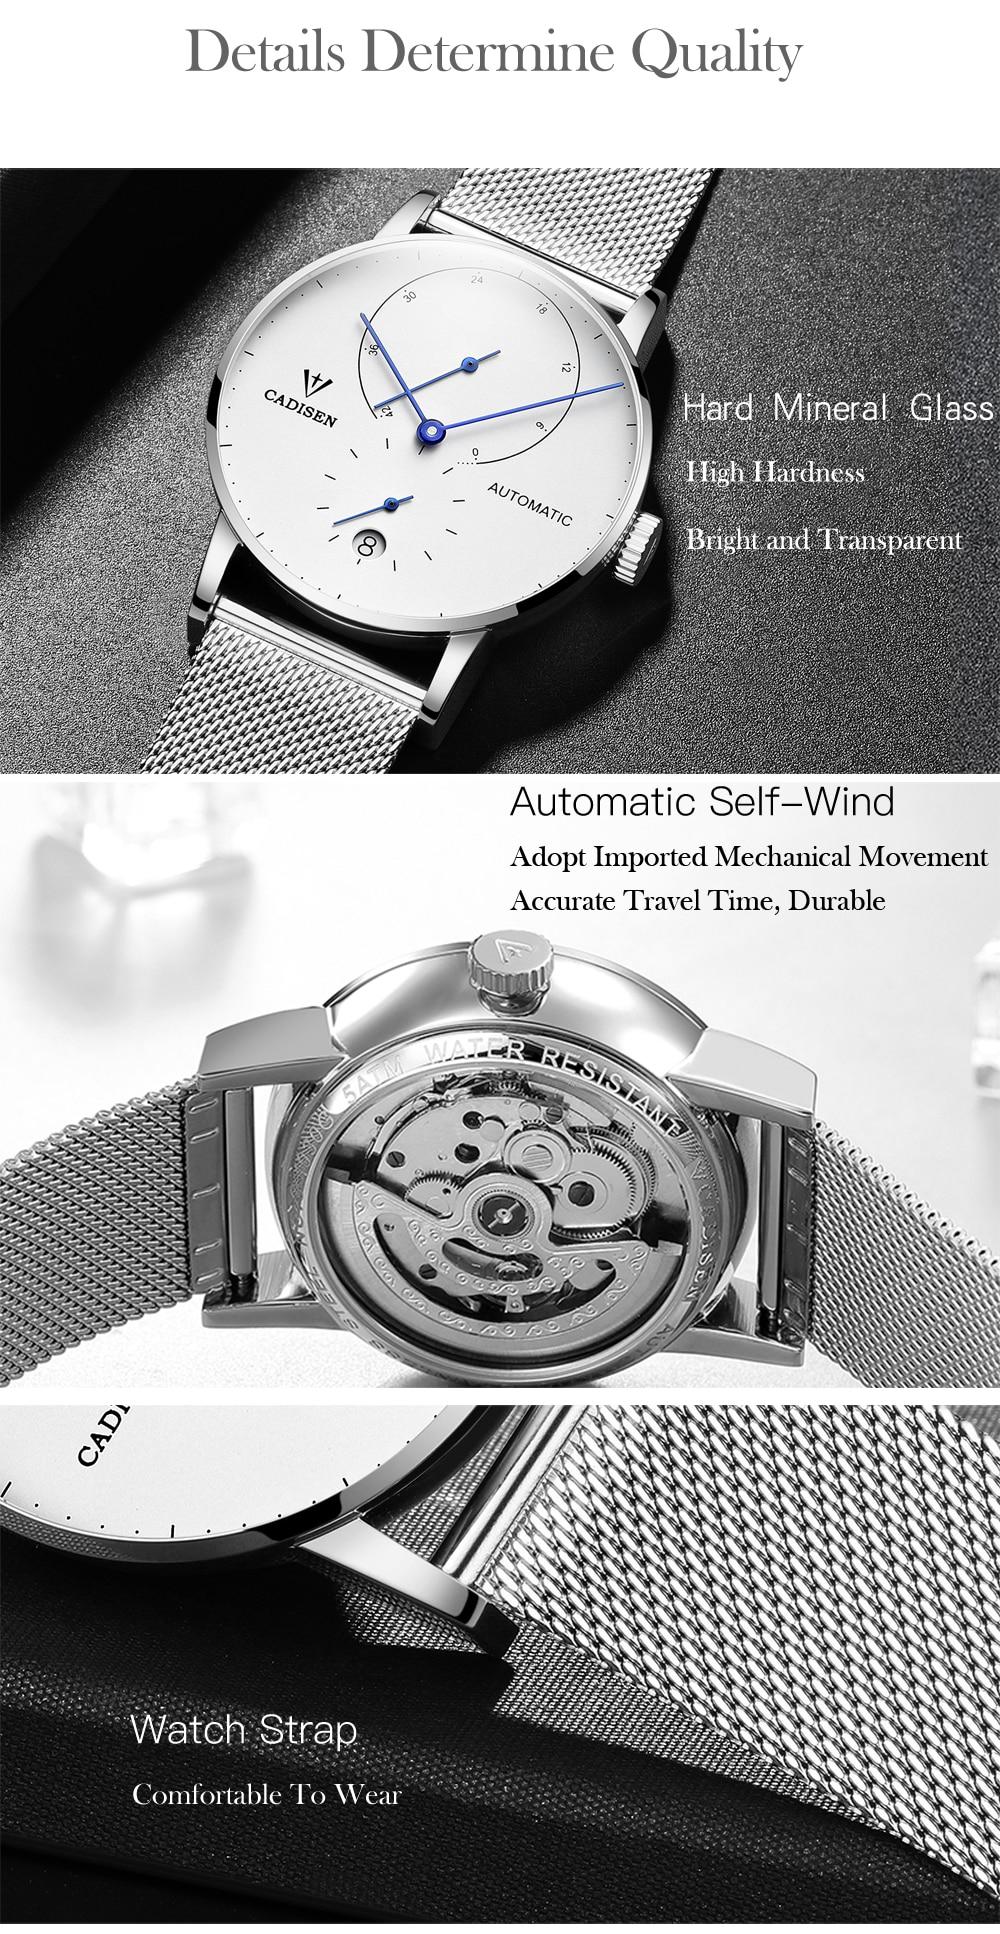 HTB159.6kvImBKNjSZFlq6A43FXaq Mens Watches CADISEN 2019 Top Luxury Brand Automatic Mechanical Watch Men Full Steel Business Waterproof Fashion Sport Watches